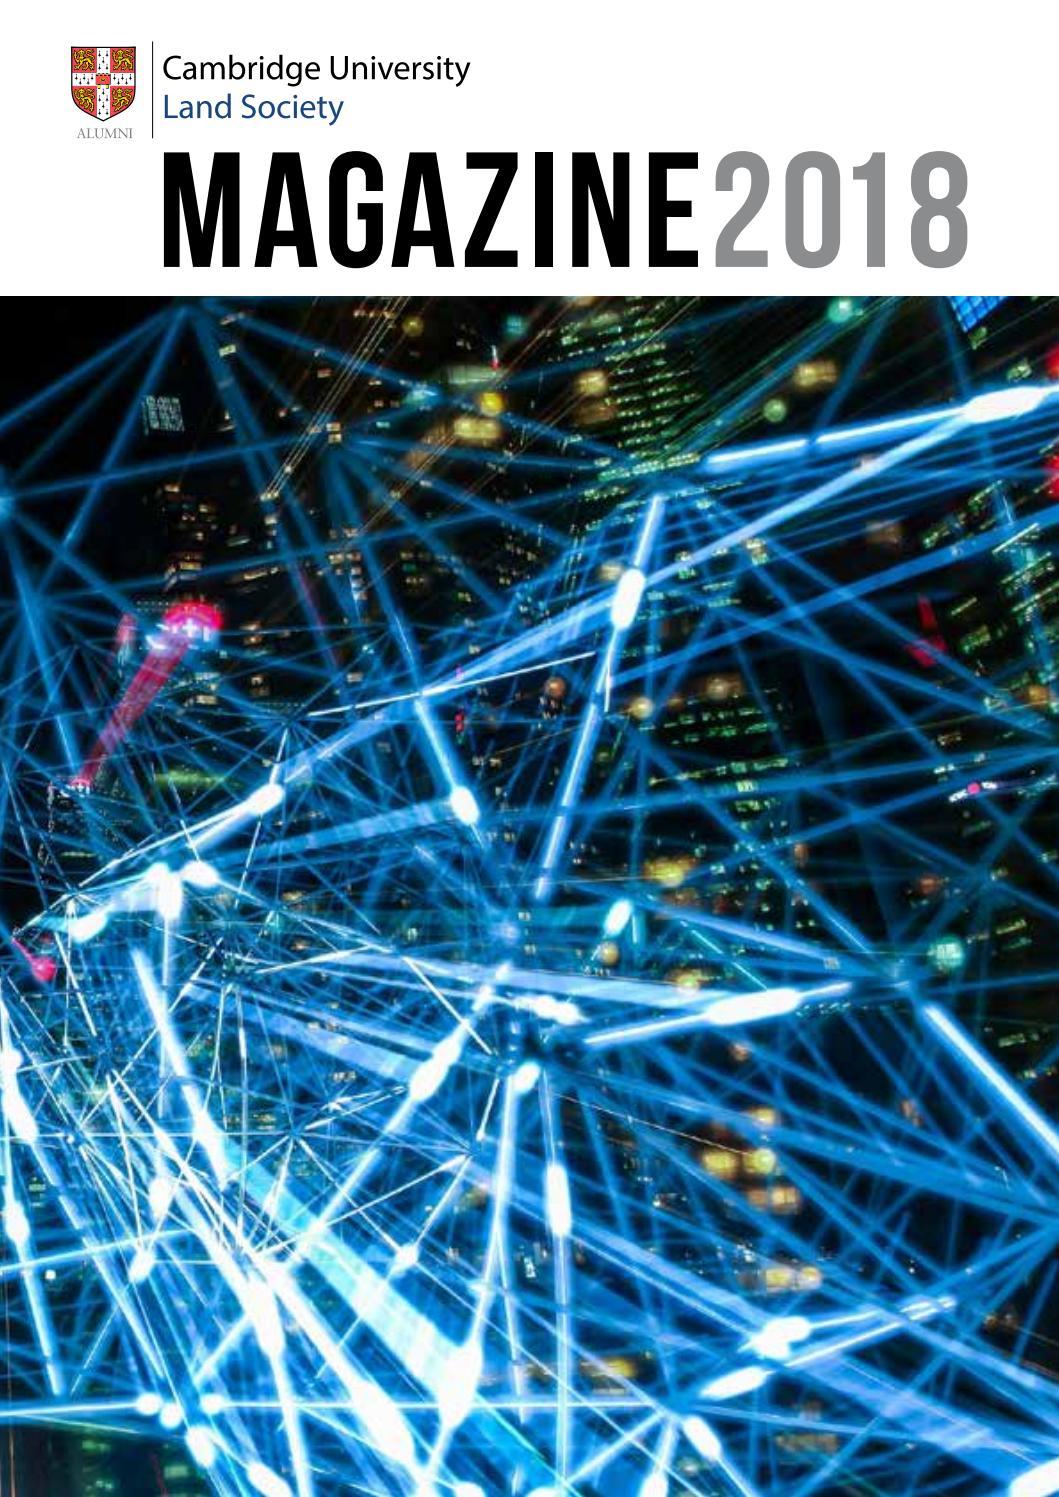 best website c2dd0 74e9d CULS Magazine 2018 by Cambridge University Land Society - issuu